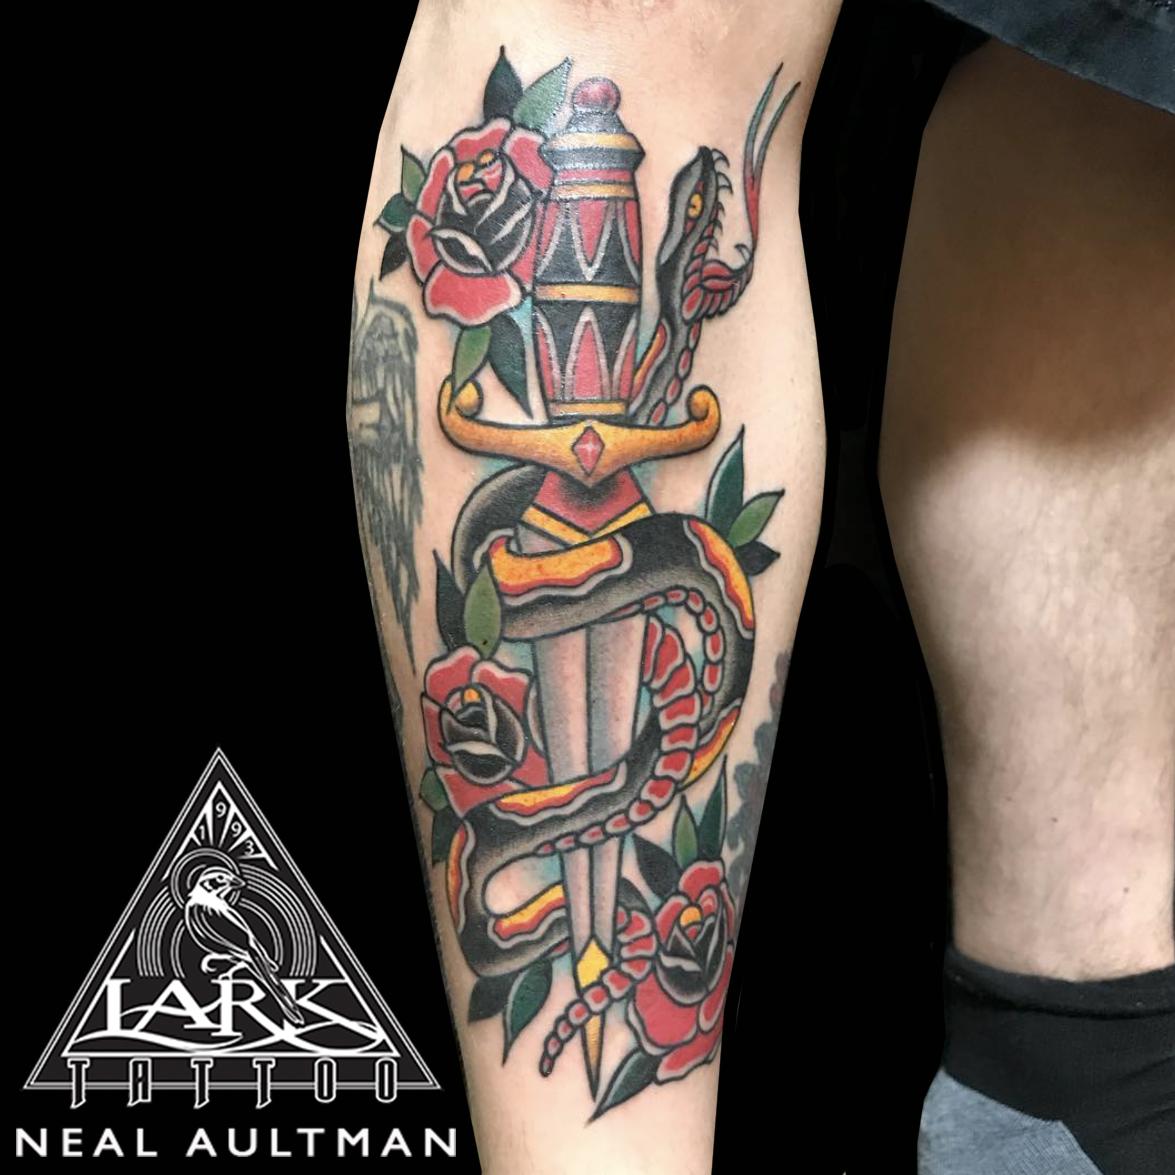 #colortattoo #traditional #traditionaltattoo #dagger #daggertattoo #snake #snaketattoo #traditionaldagger #traditionaldaggertattoo #traditionalsnake #traditionalsnaketattoo #traditionaltattooartist #legtattoo #rose #rosetattoo #traditionalrose #traditionalrosetattoo #tattoo #tattoos #larktattoo #tat #tats #tatts #tatted #tattedup #tattoist #tattooed #inked #inkedup #ink #tattoooftheday #amazingink #bodyart #tattooig #tattoosofinstagram #instatats #larktattoos #larktattoowestbury #westbury #longisland #NY #NewYork #usa #art